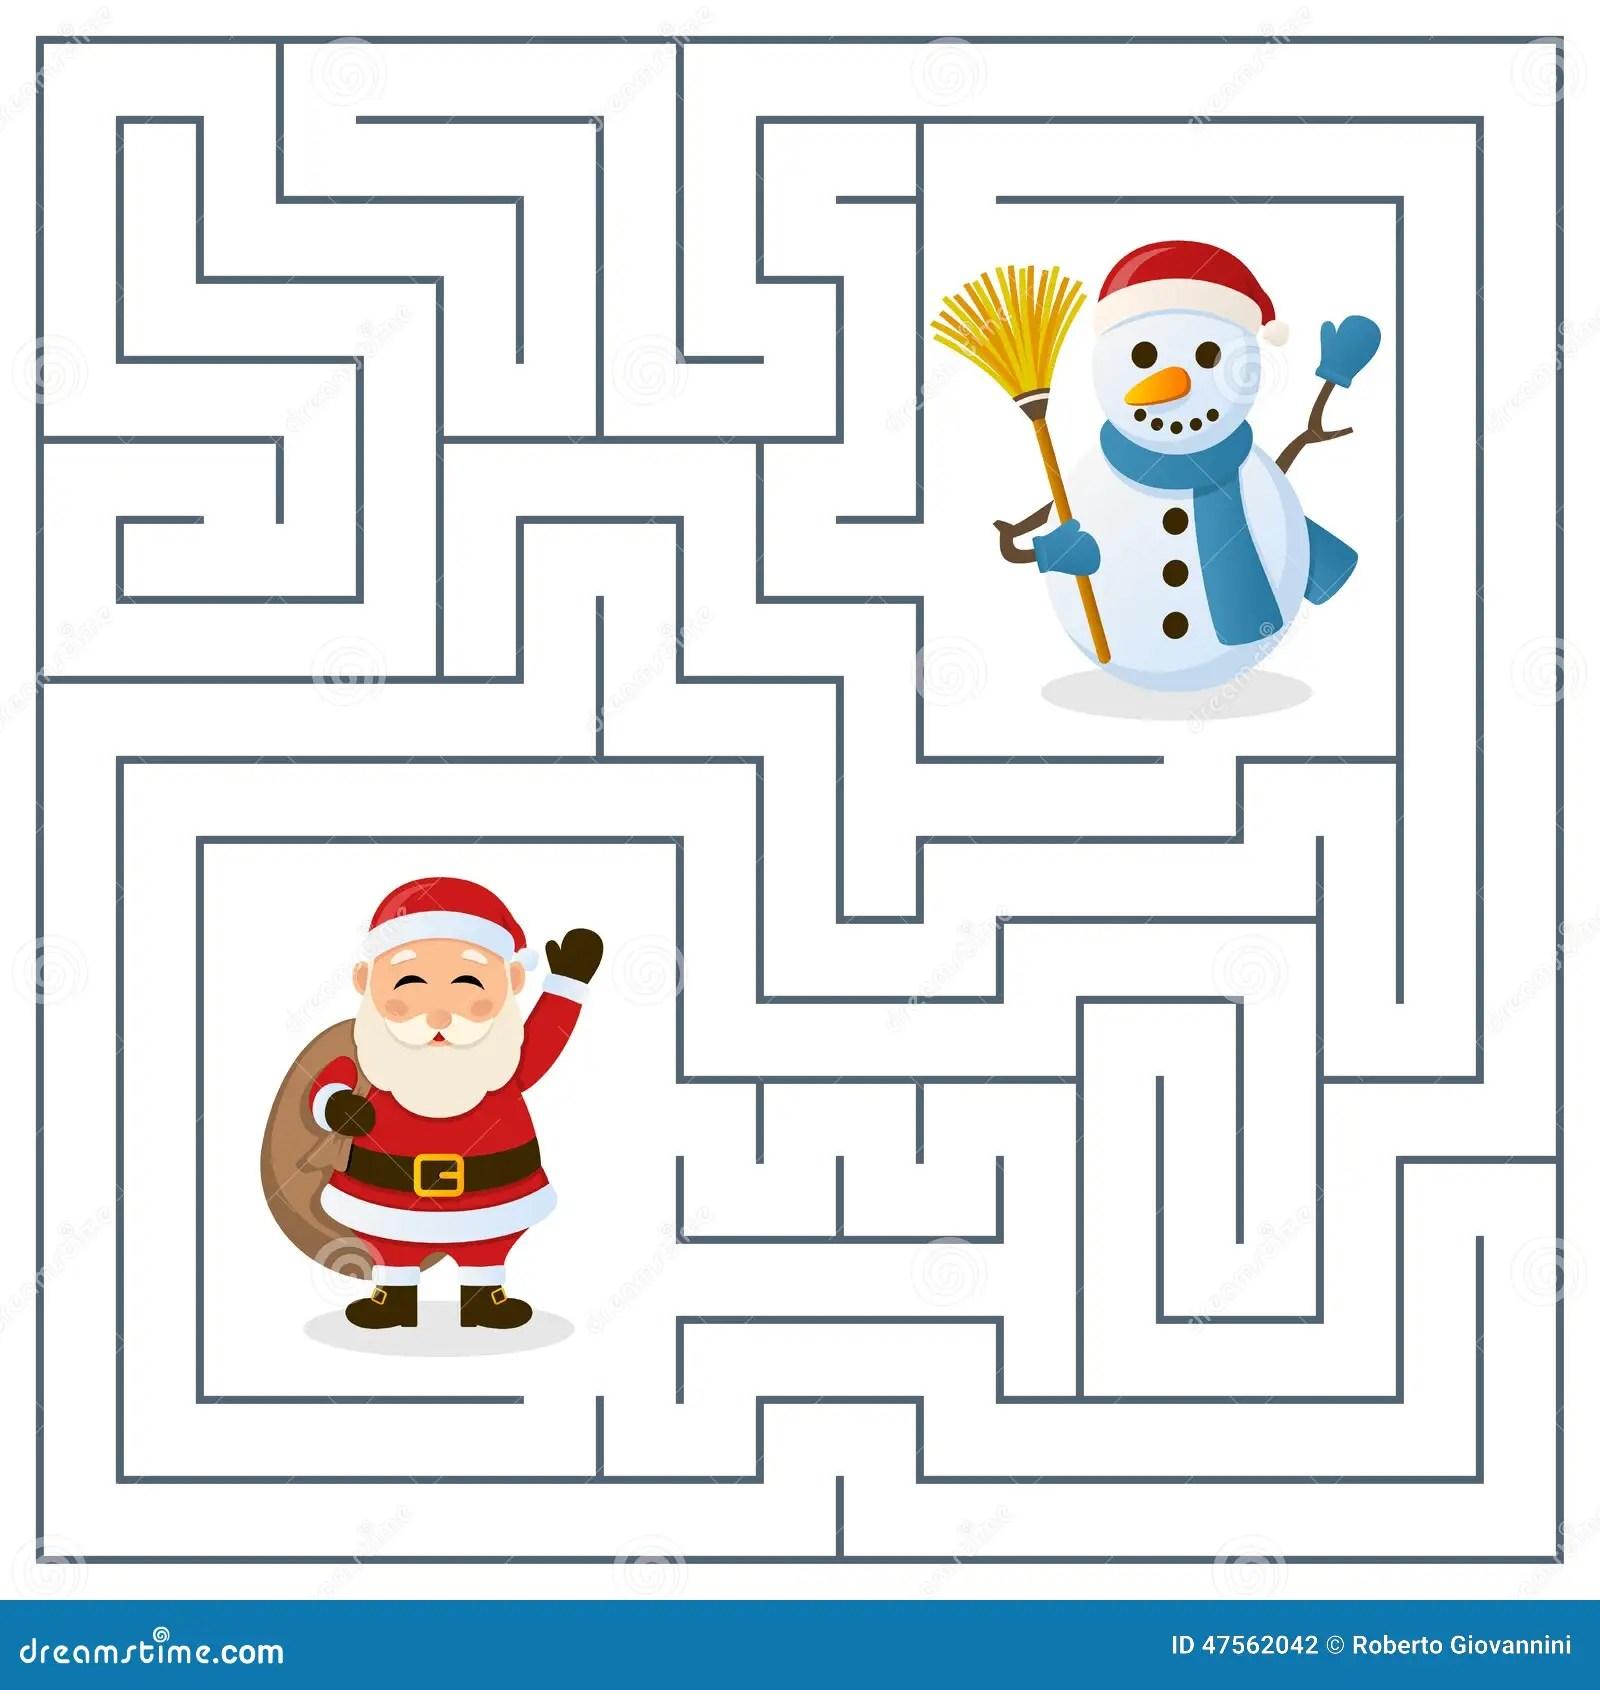 Santa Claus Amp Snowman Maze For Kids Stock Vector